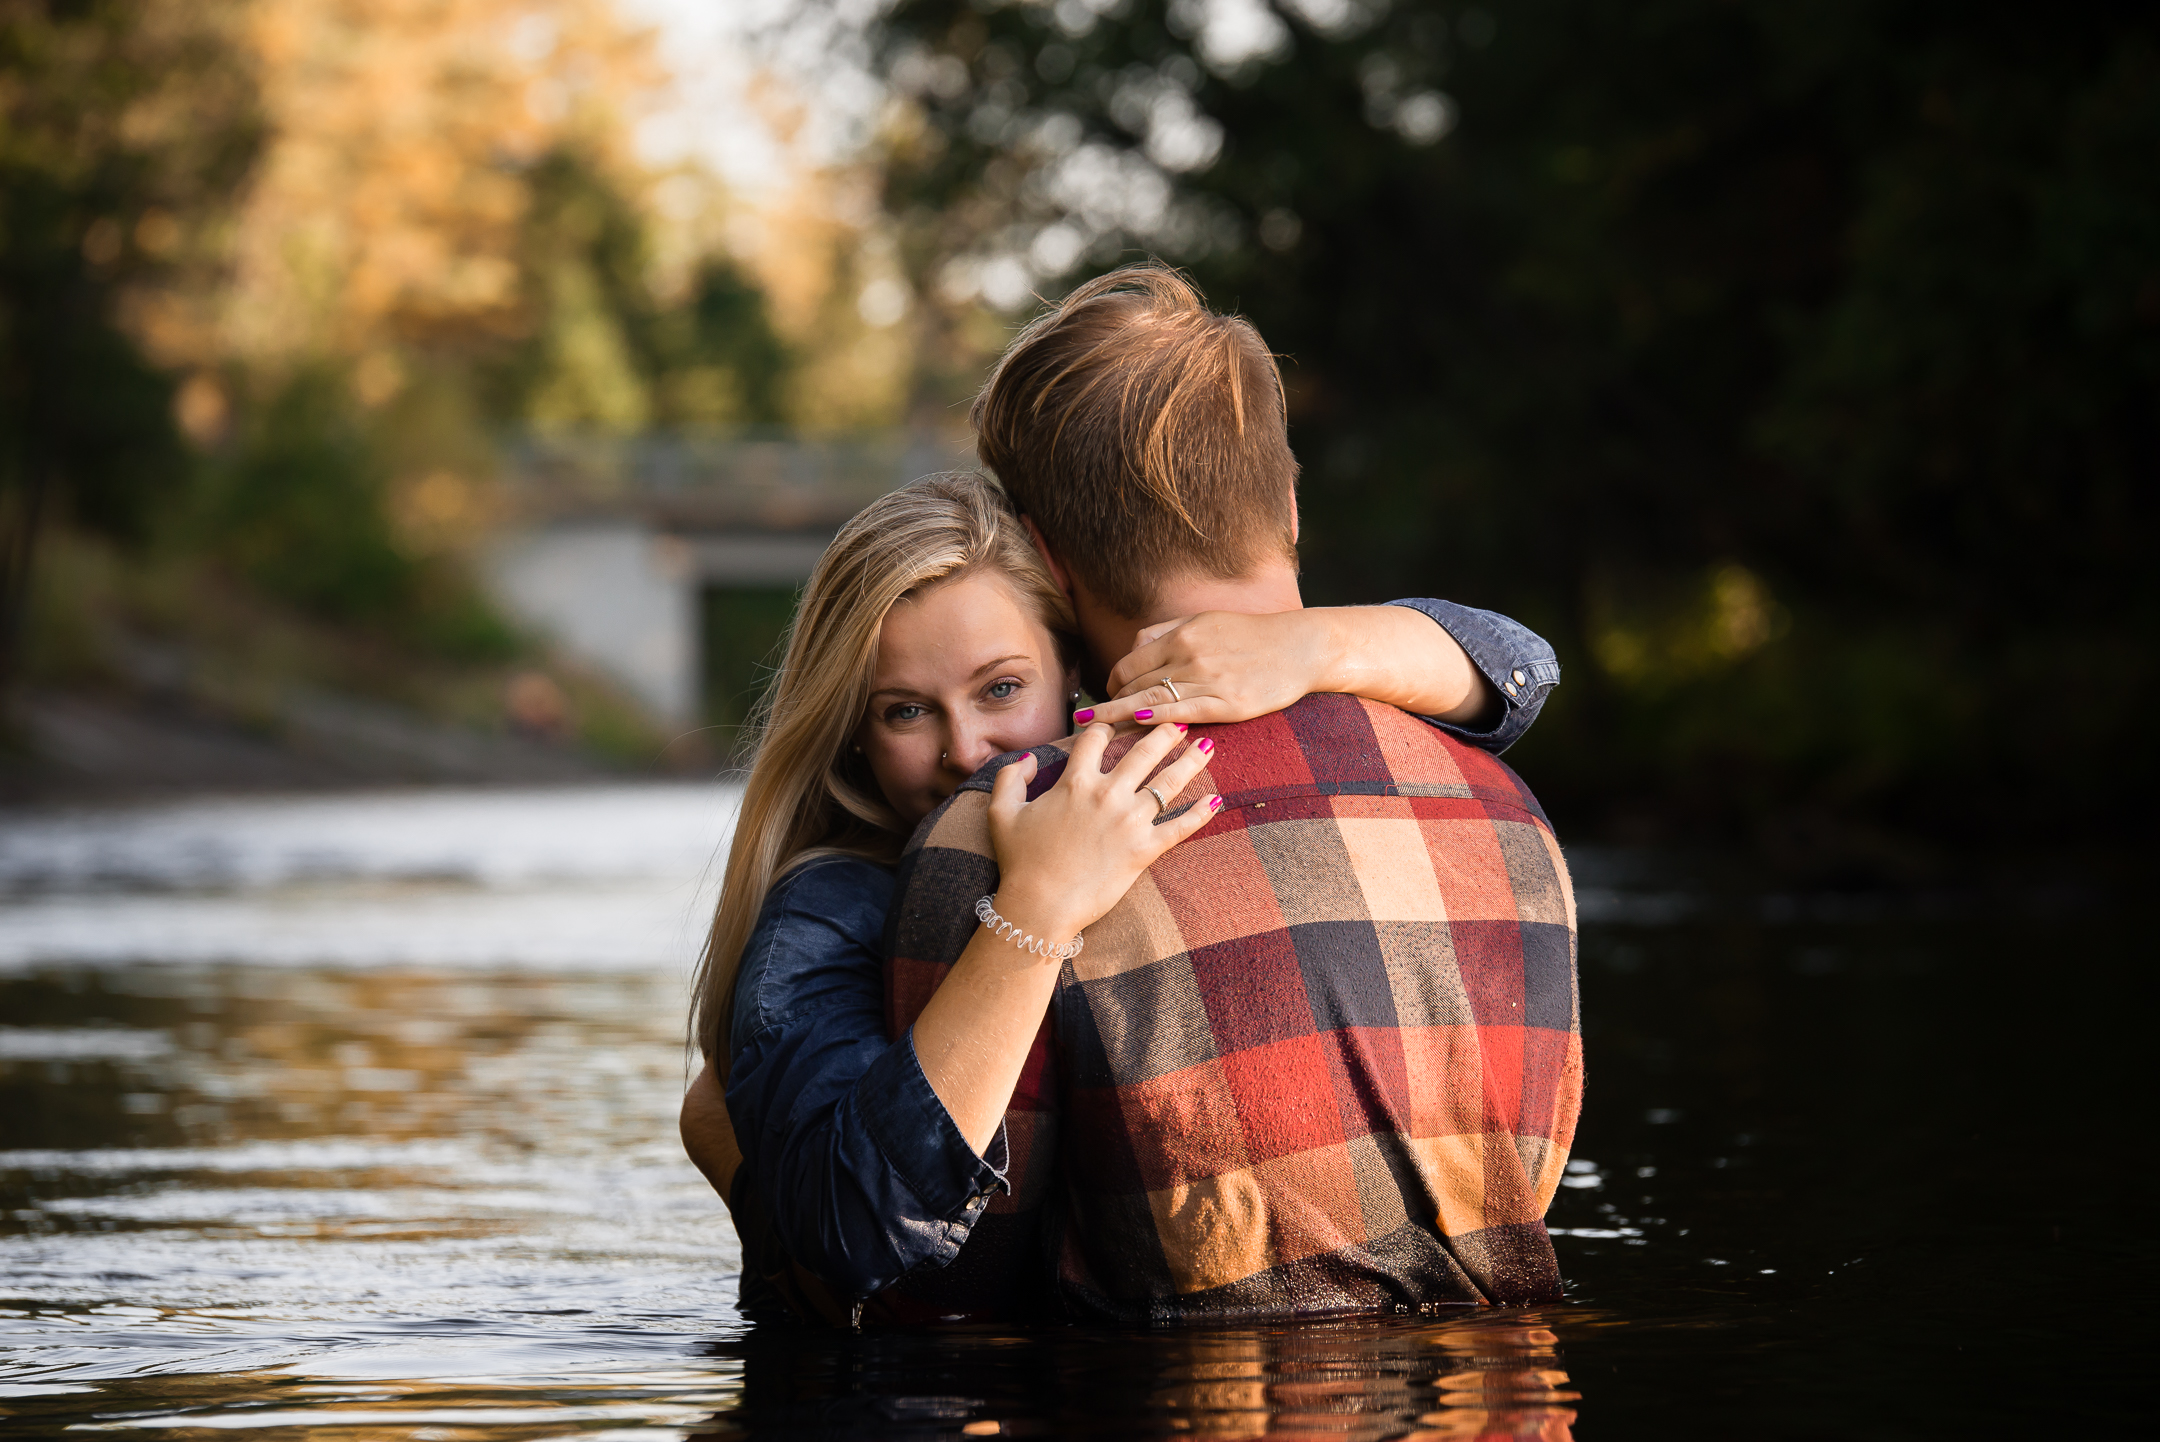 Naomi Lucienne Photography - Couples - 170923815.jpg